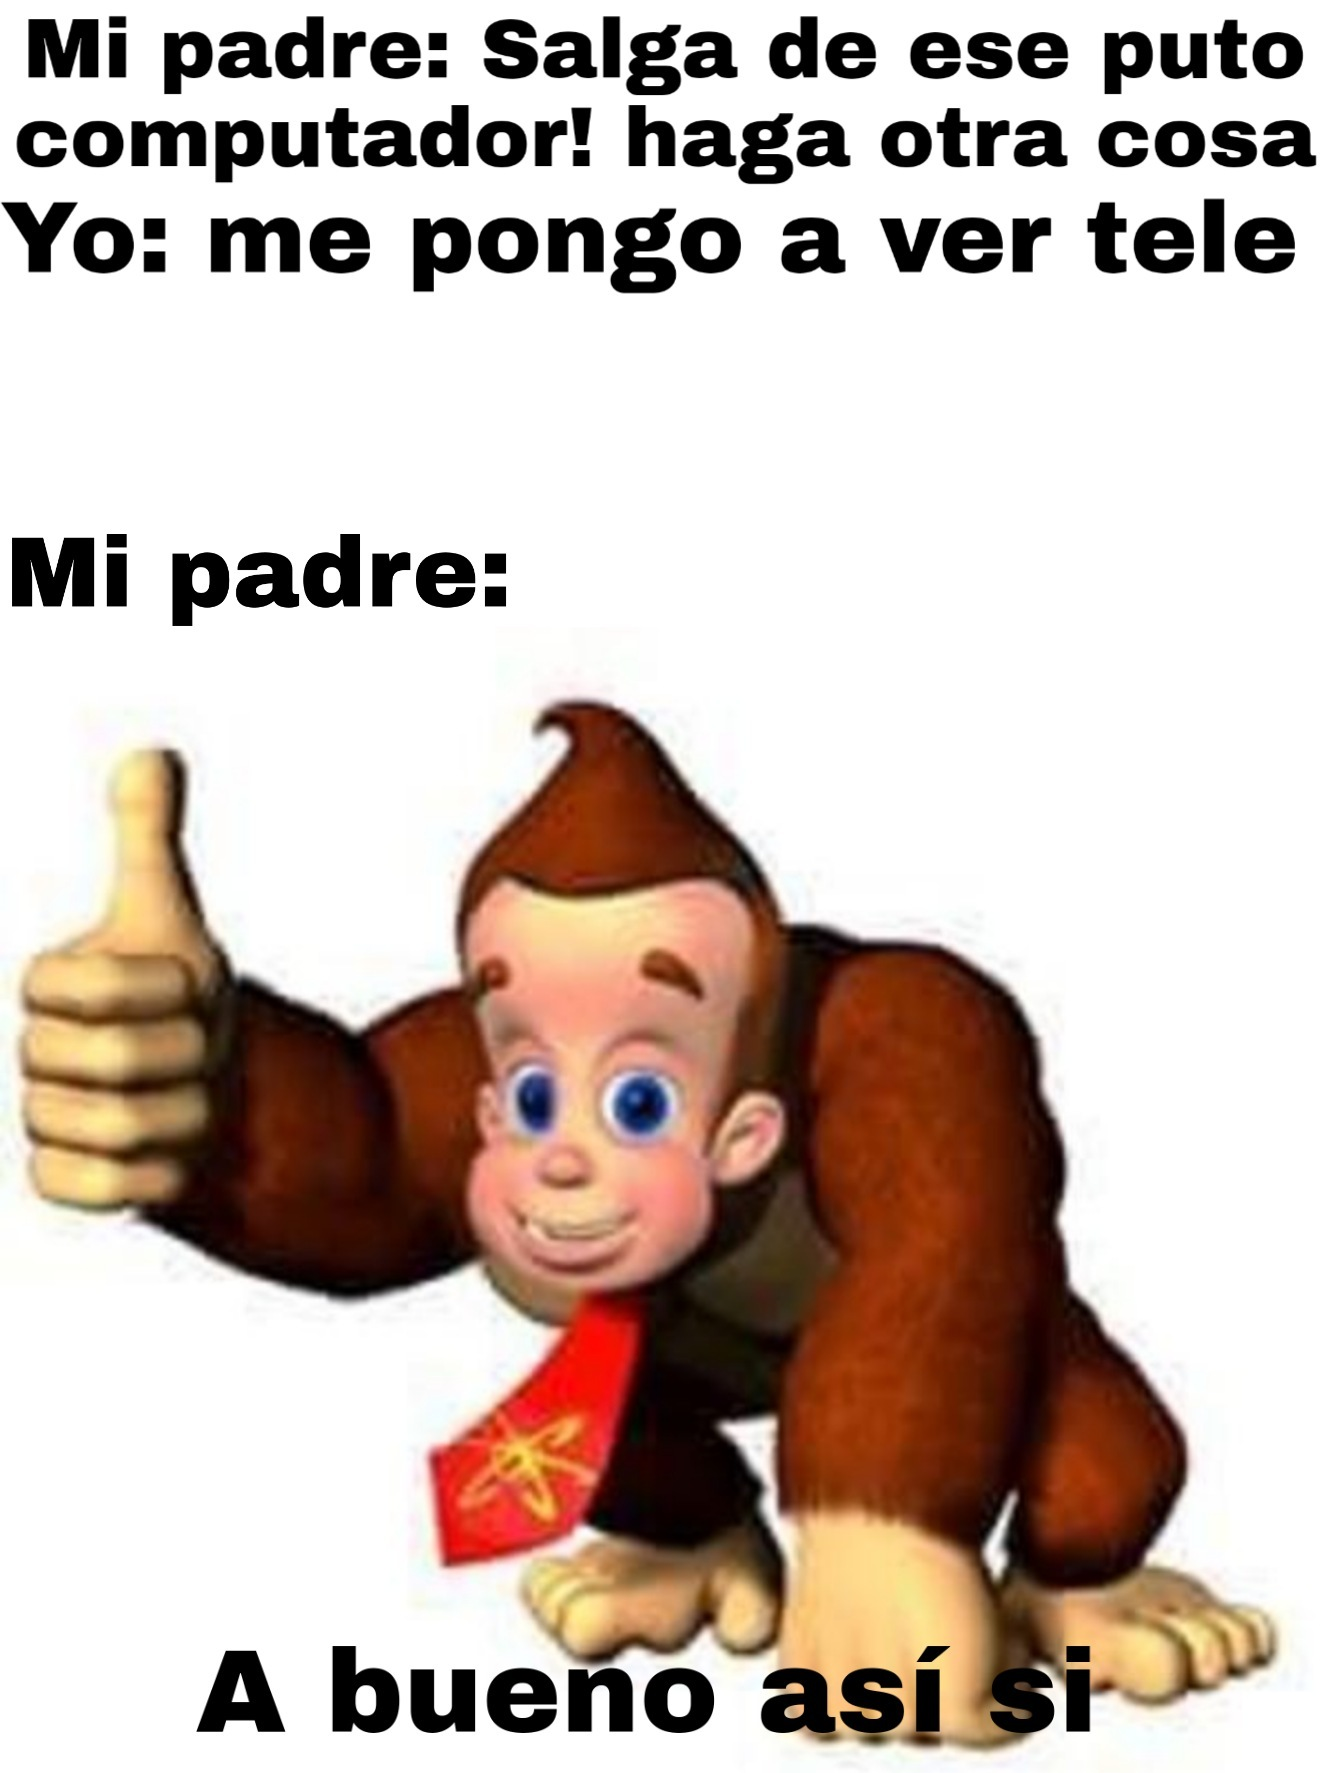 Jimmy Kong, Donkey neutron - meme